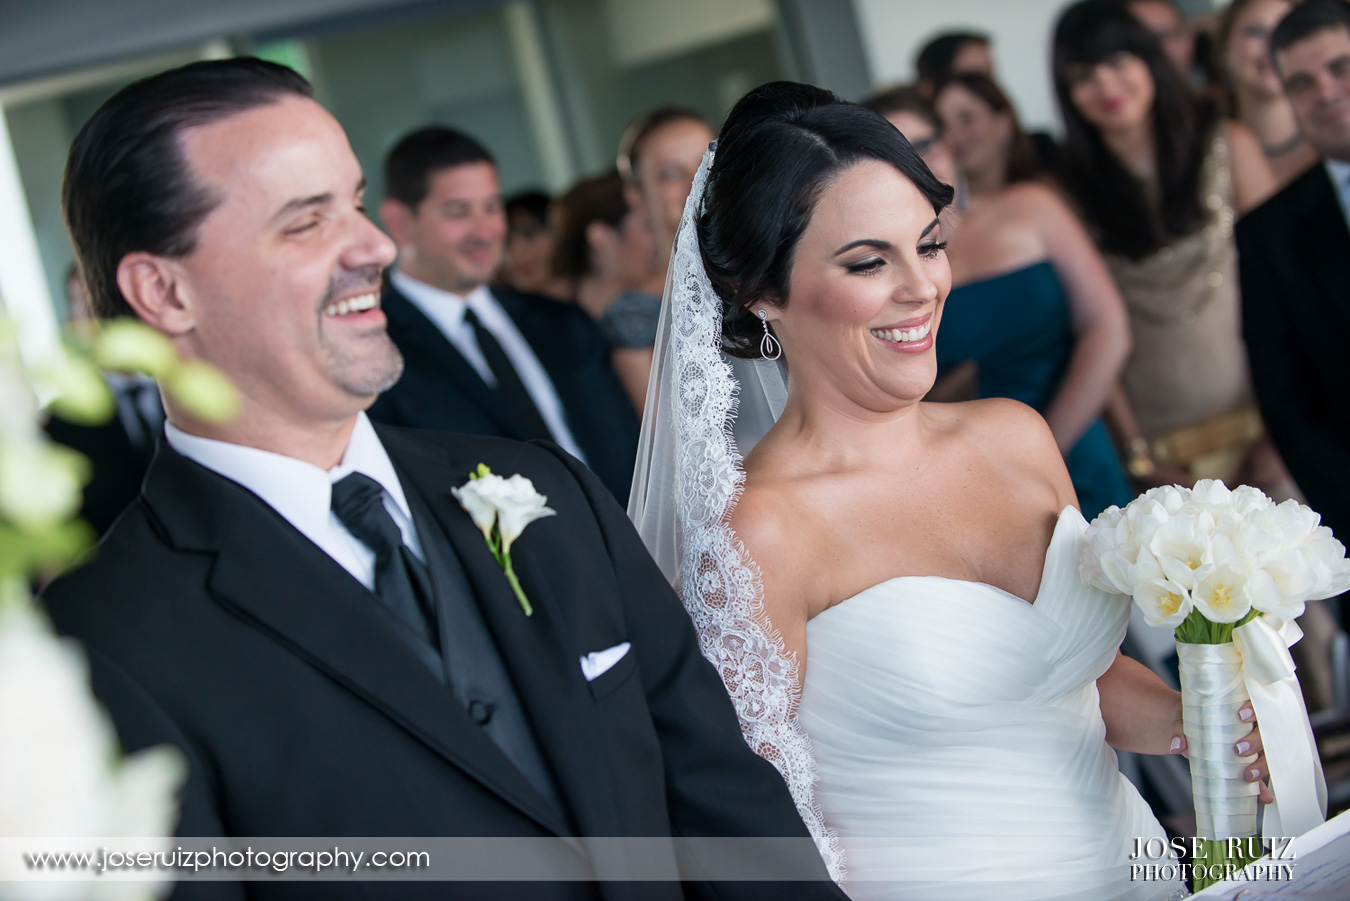 Vanessa-&-Antonio-0035.jpg